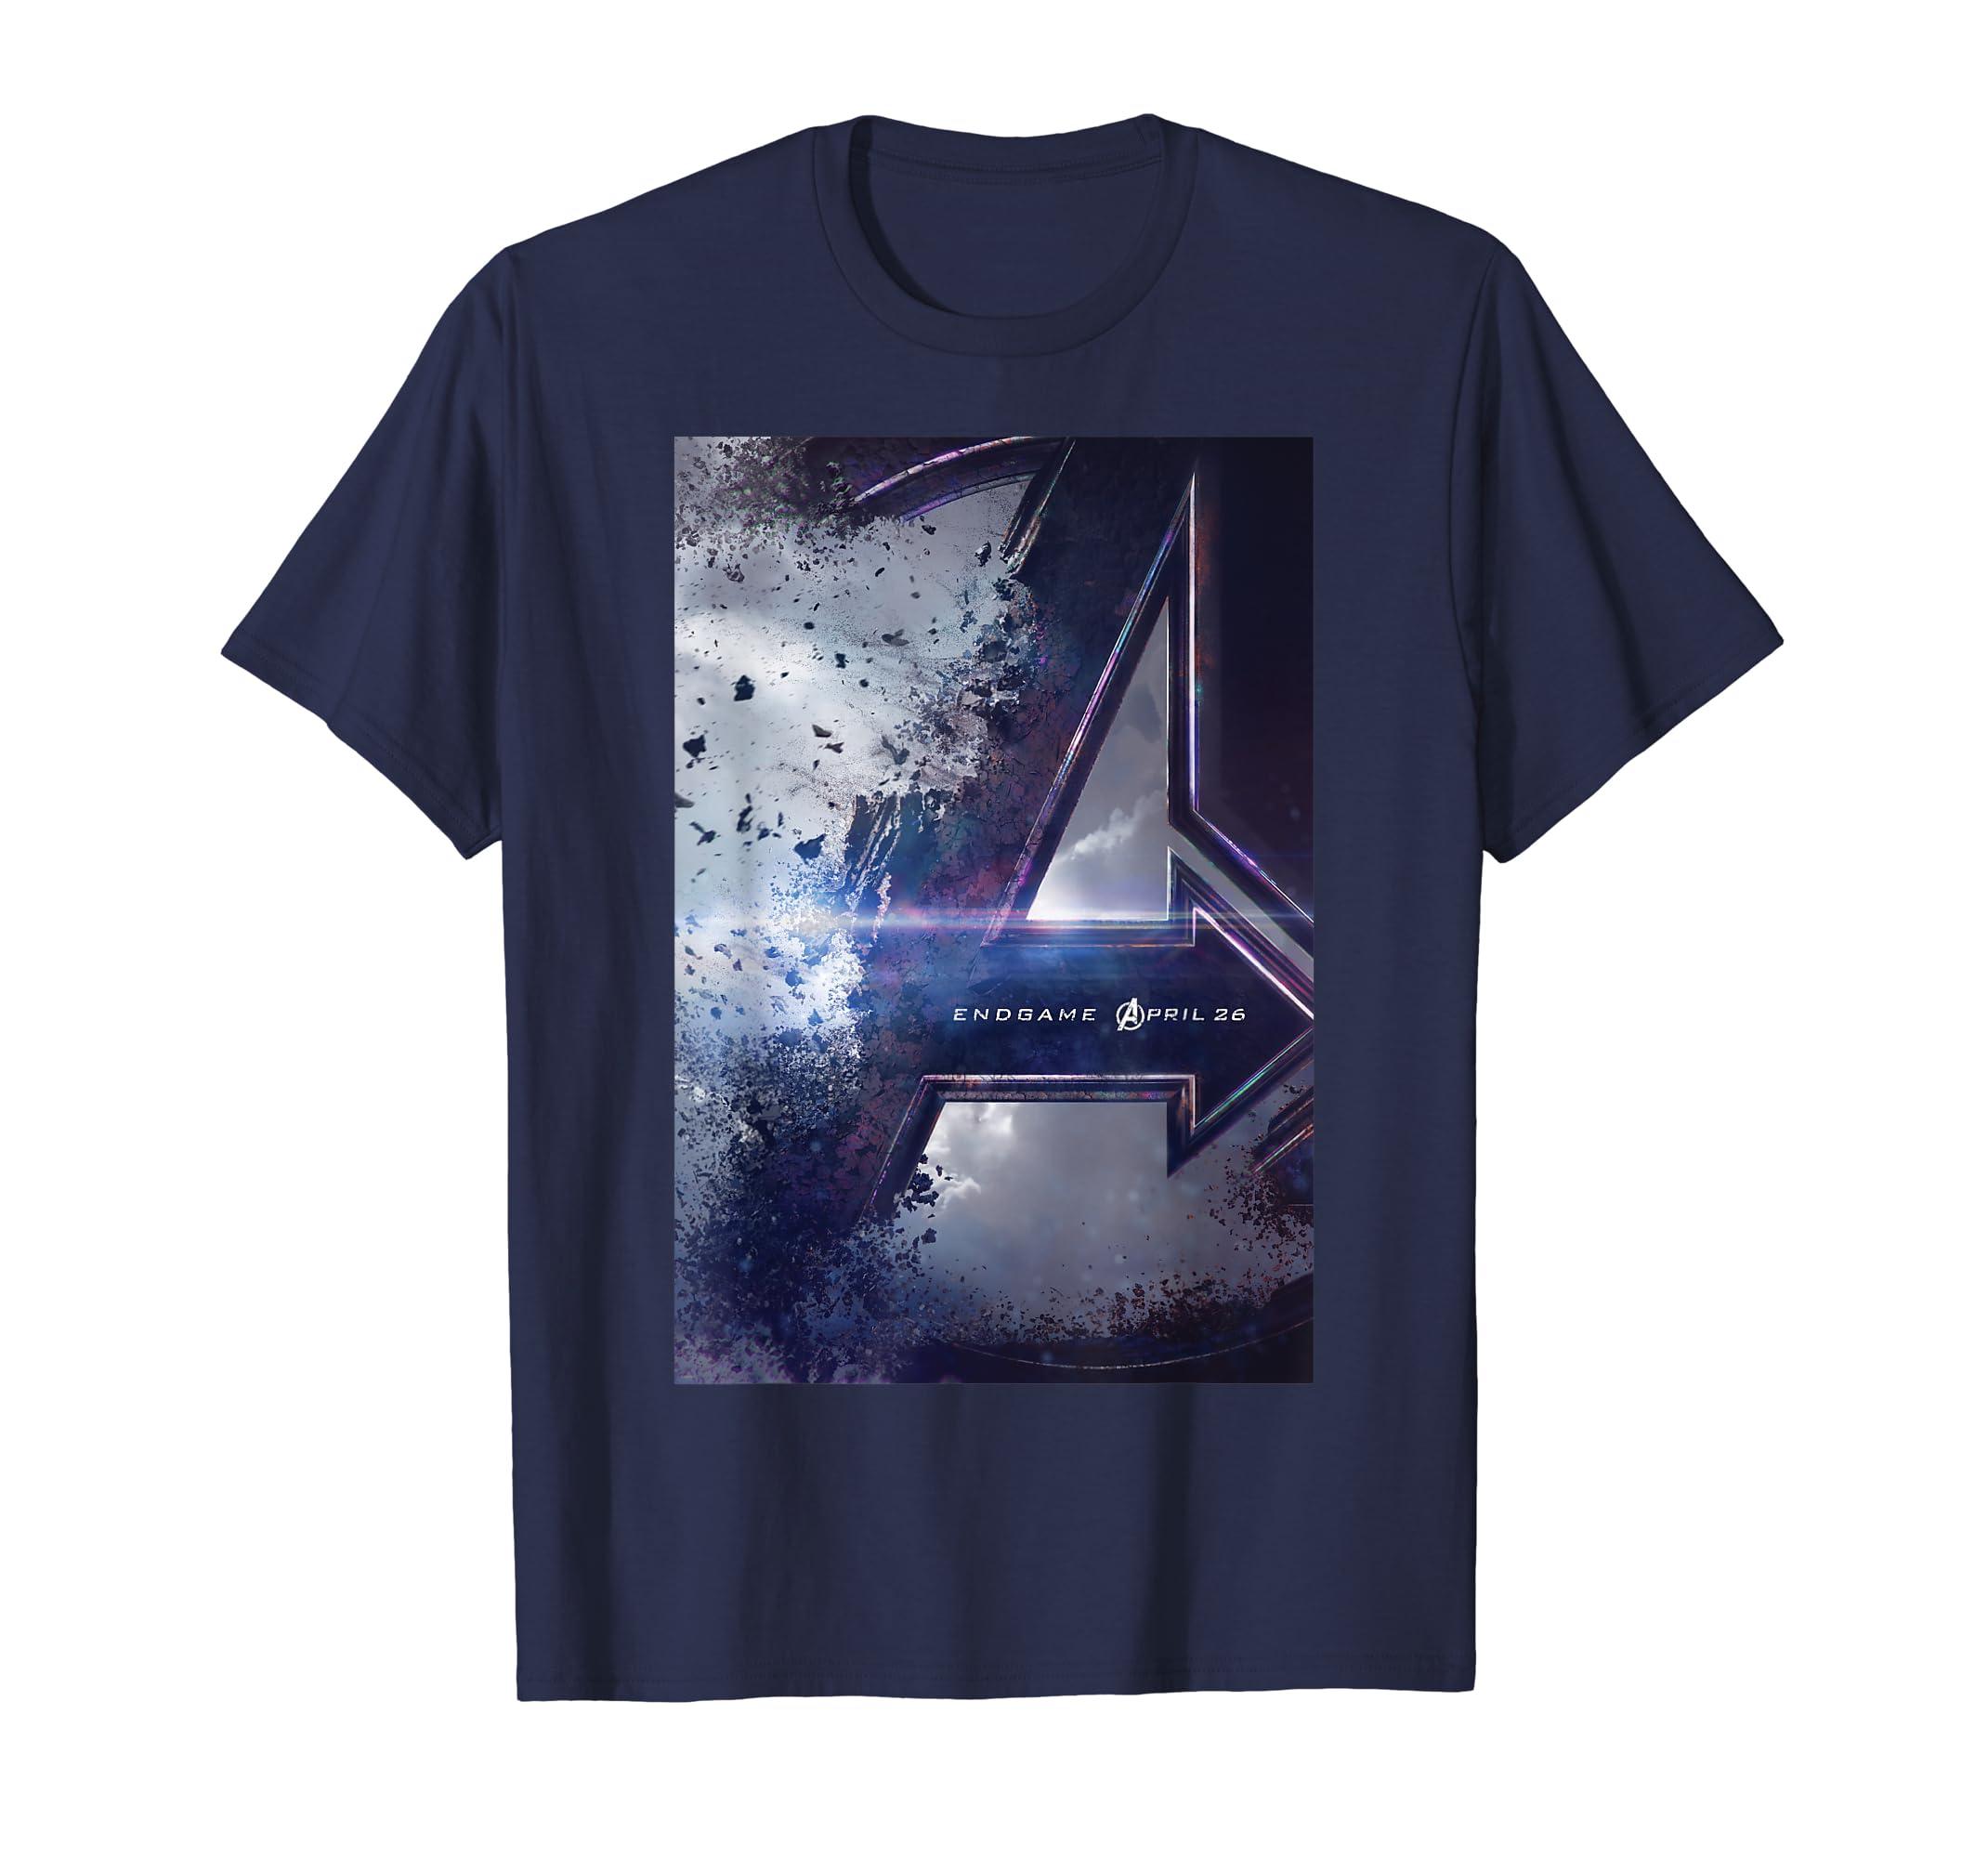 720dc8e27ba Amazon.com: Marvel Avengers Endgame Movie Poster Graphic T-Shirt: Clothing